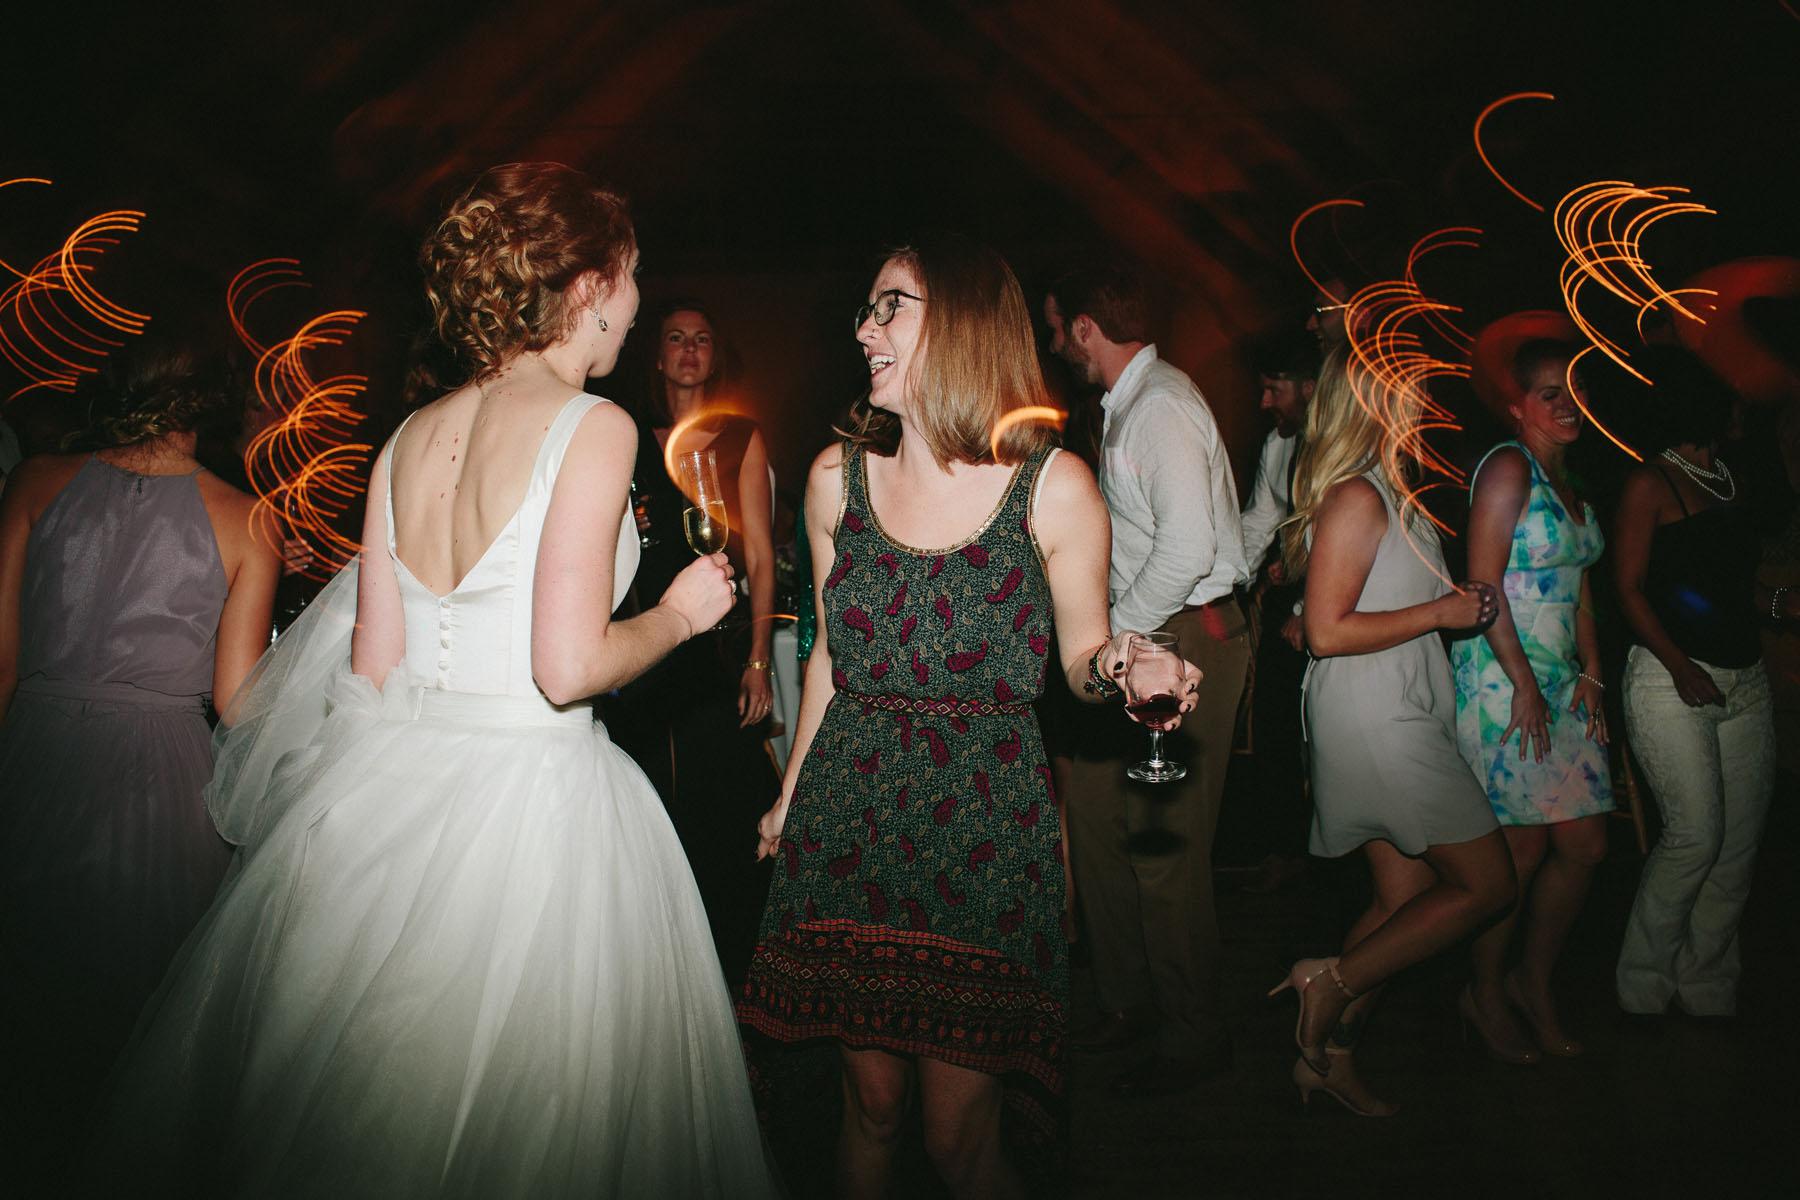 thetis-island-wedding-photographer-rp-rn-207.jpg